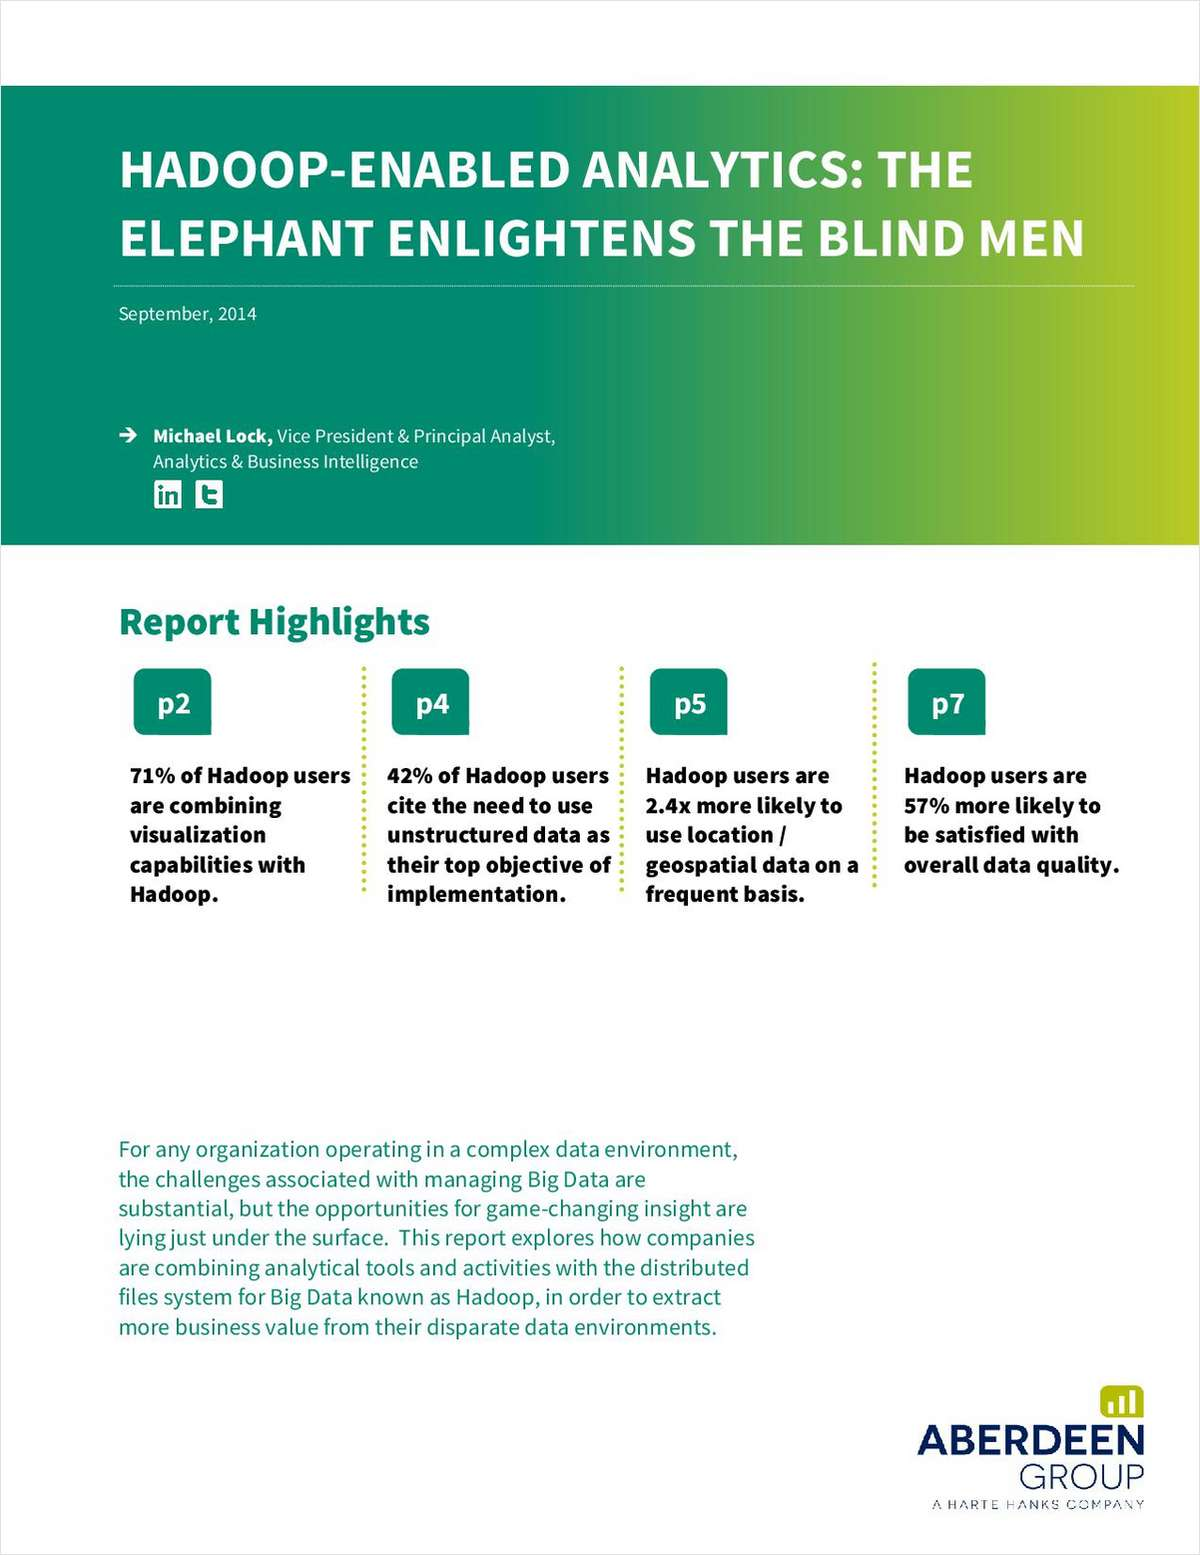 Hadoop-Enabled Analytics: The Elephant Enlightens the Blind Men